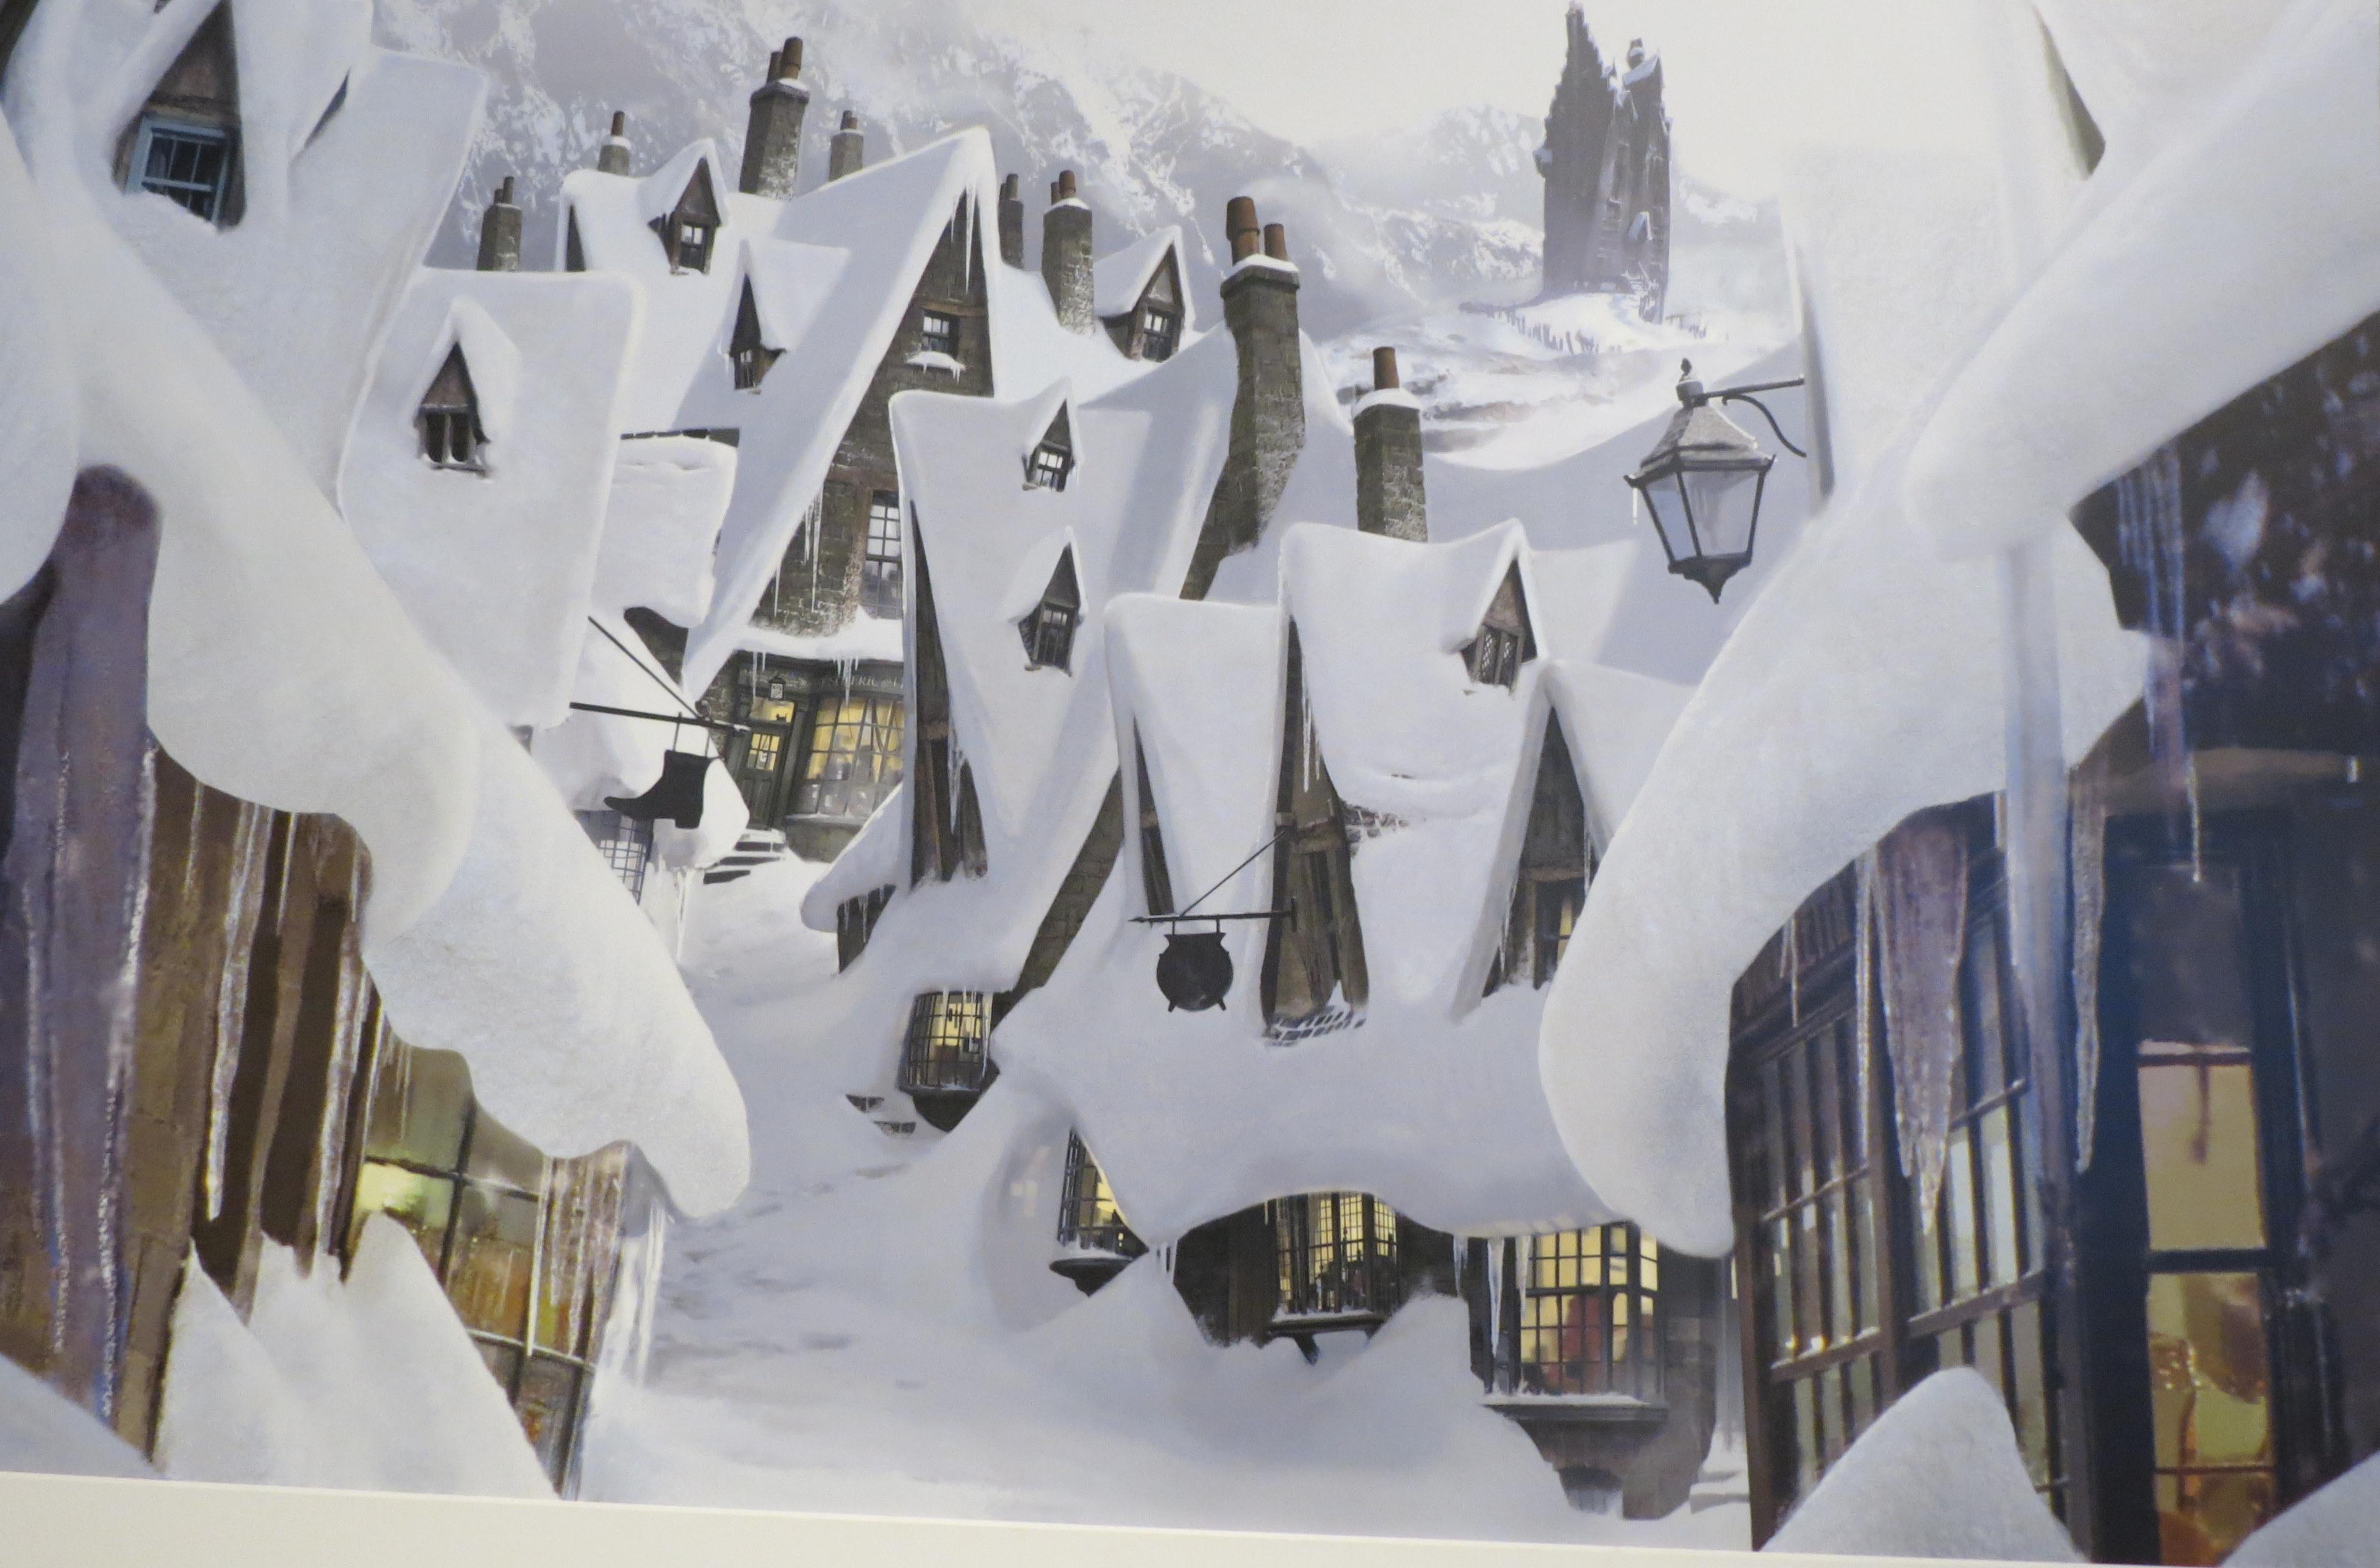 Popular Wallpaper Harry Potter Concept Art - concept_artist_dermot_power_harry_potter_films_wb_by_sceptre63-d8gjffw  Trends_51962.jpg